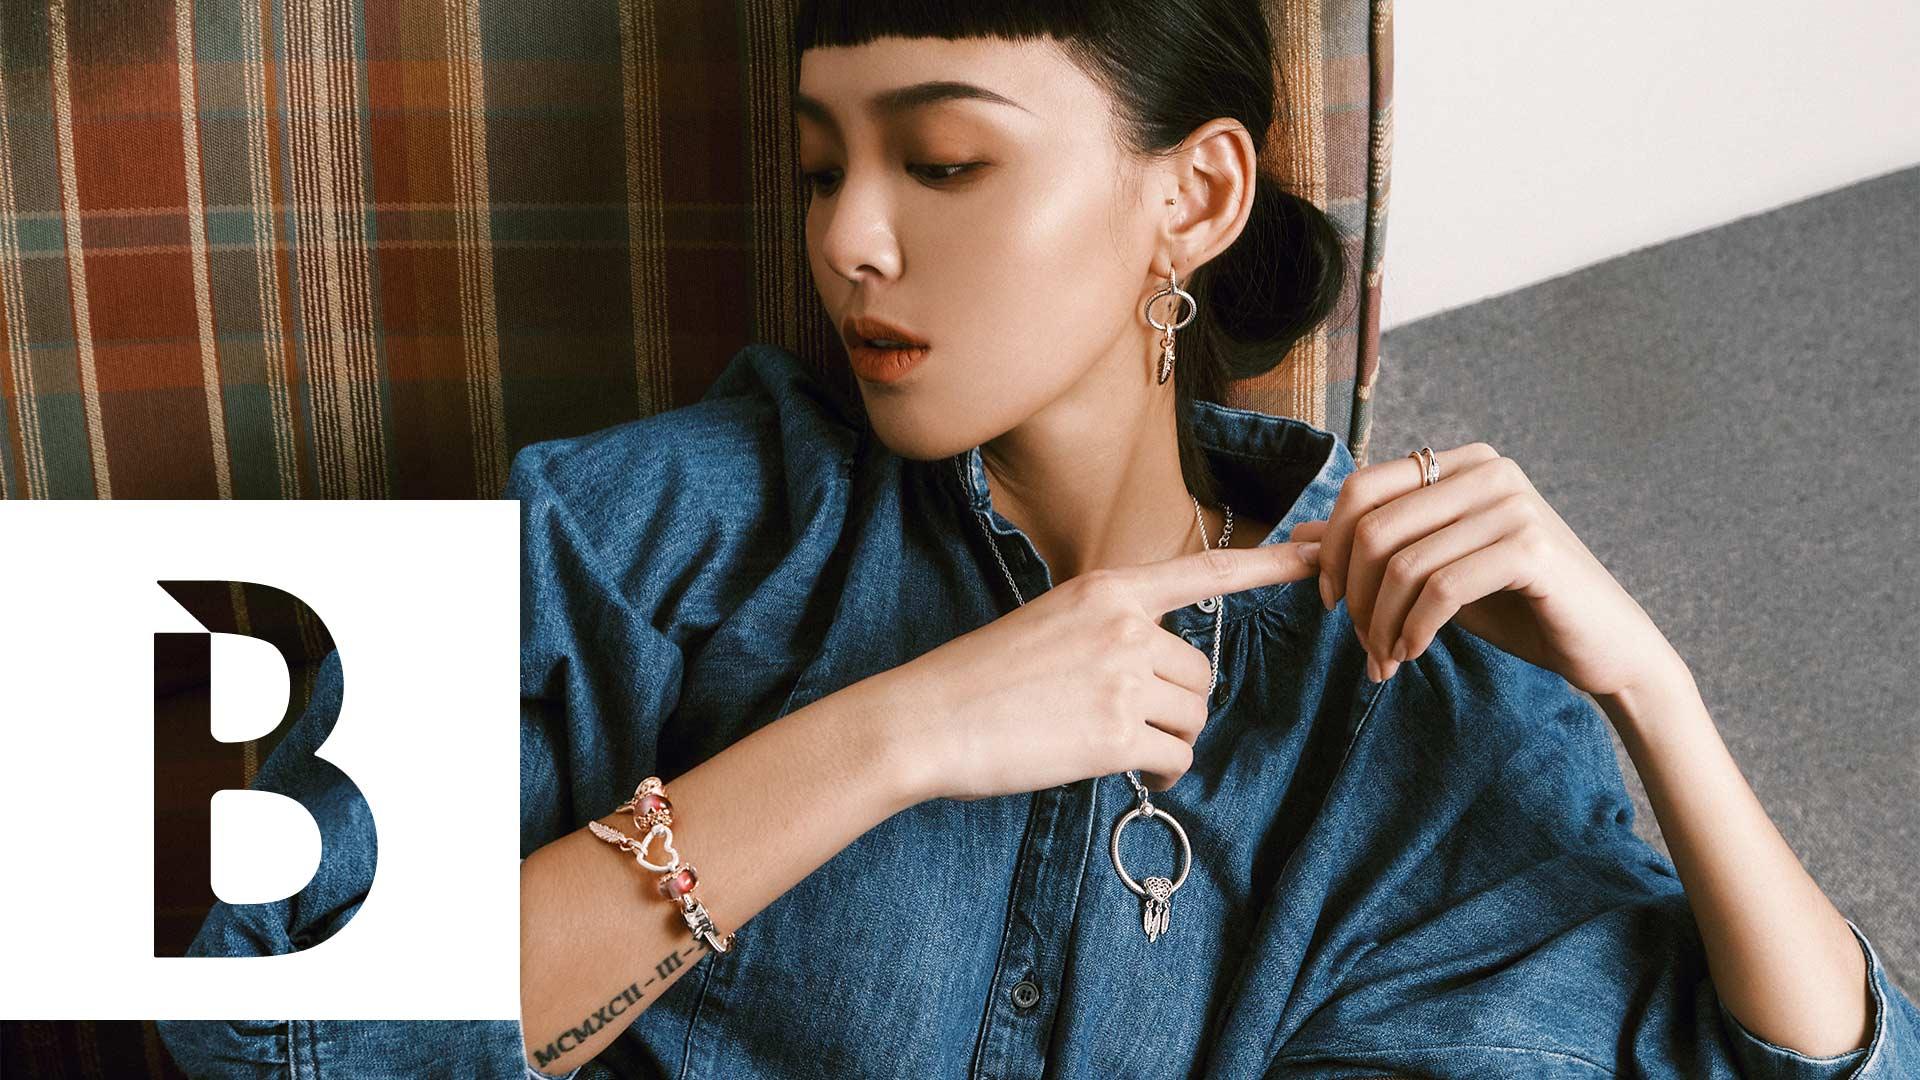 2021Pandora再創時尚新風潮!串飾也能變為腰飾、鑰匙圈,時尚icon李函「這樣搭」佩戴出屬於自己的個人風格!